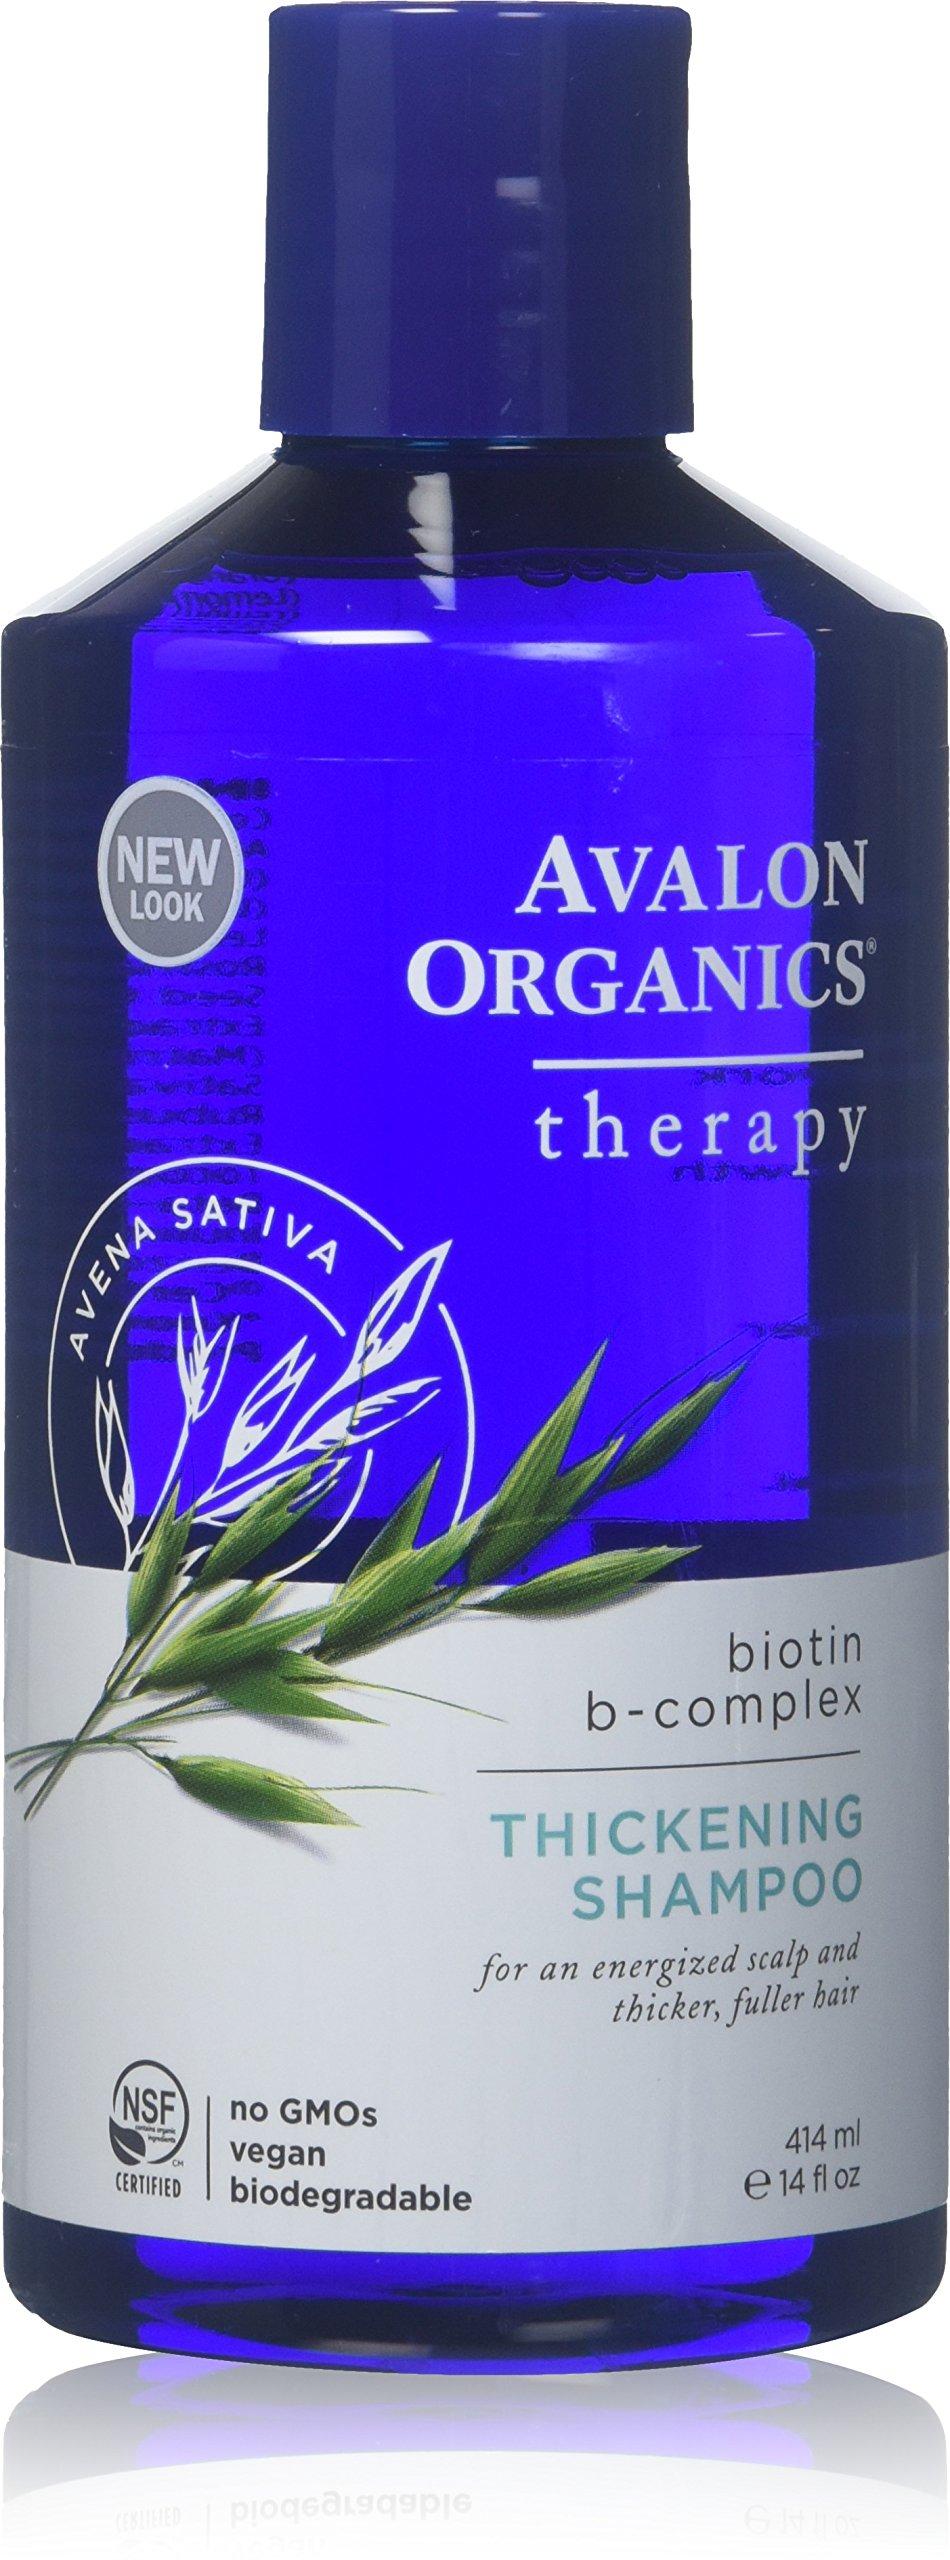 Avalon Organics Biotin B-Complex Thickening Shampoo 14 Fl Oz (Pack of 2)